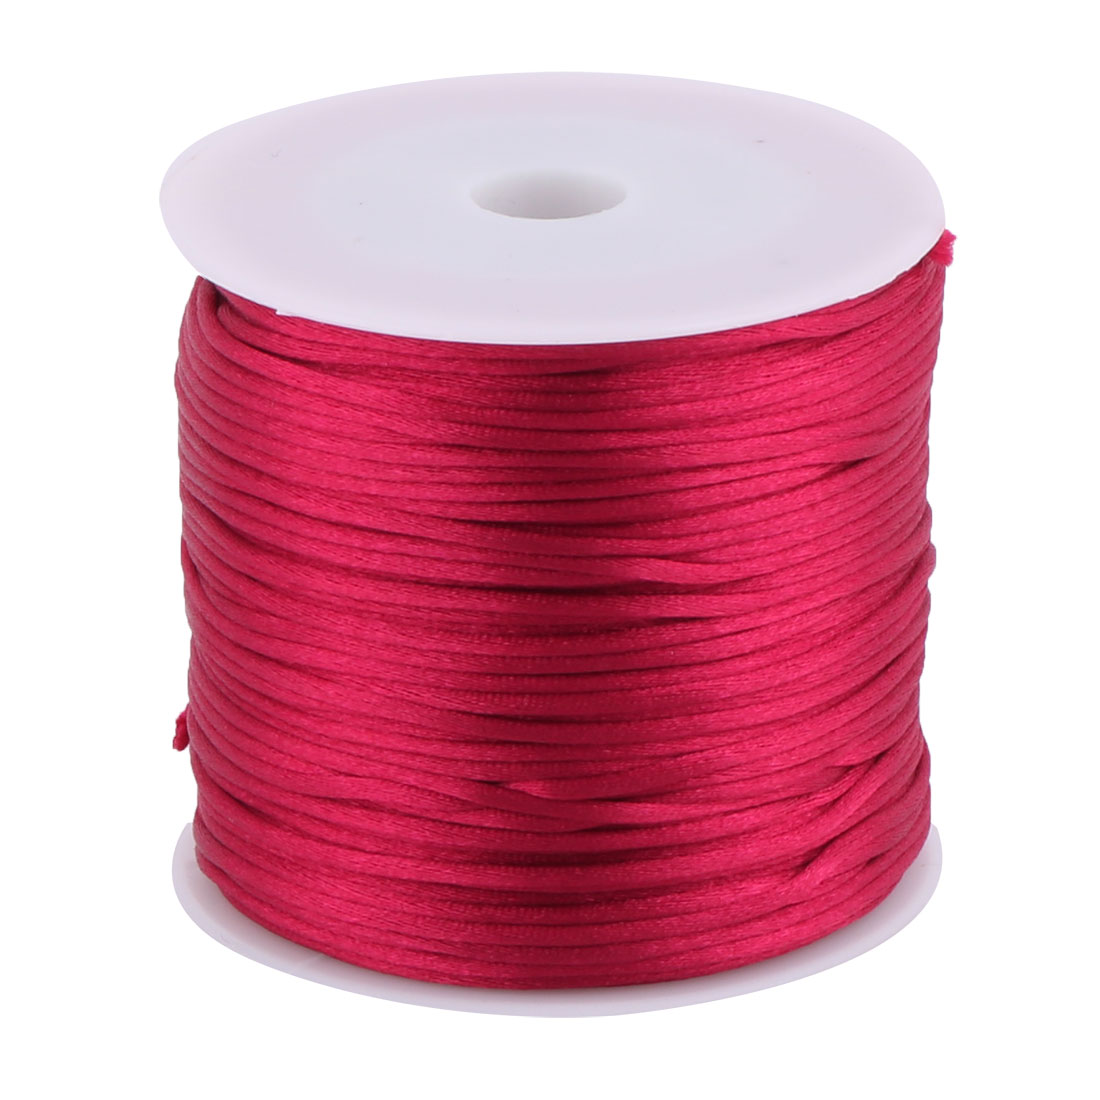 Nylon Handicraft DIY Knit Fan Decor Pendant Cord Burgundy 1.5mm Dia 78.7 Yards